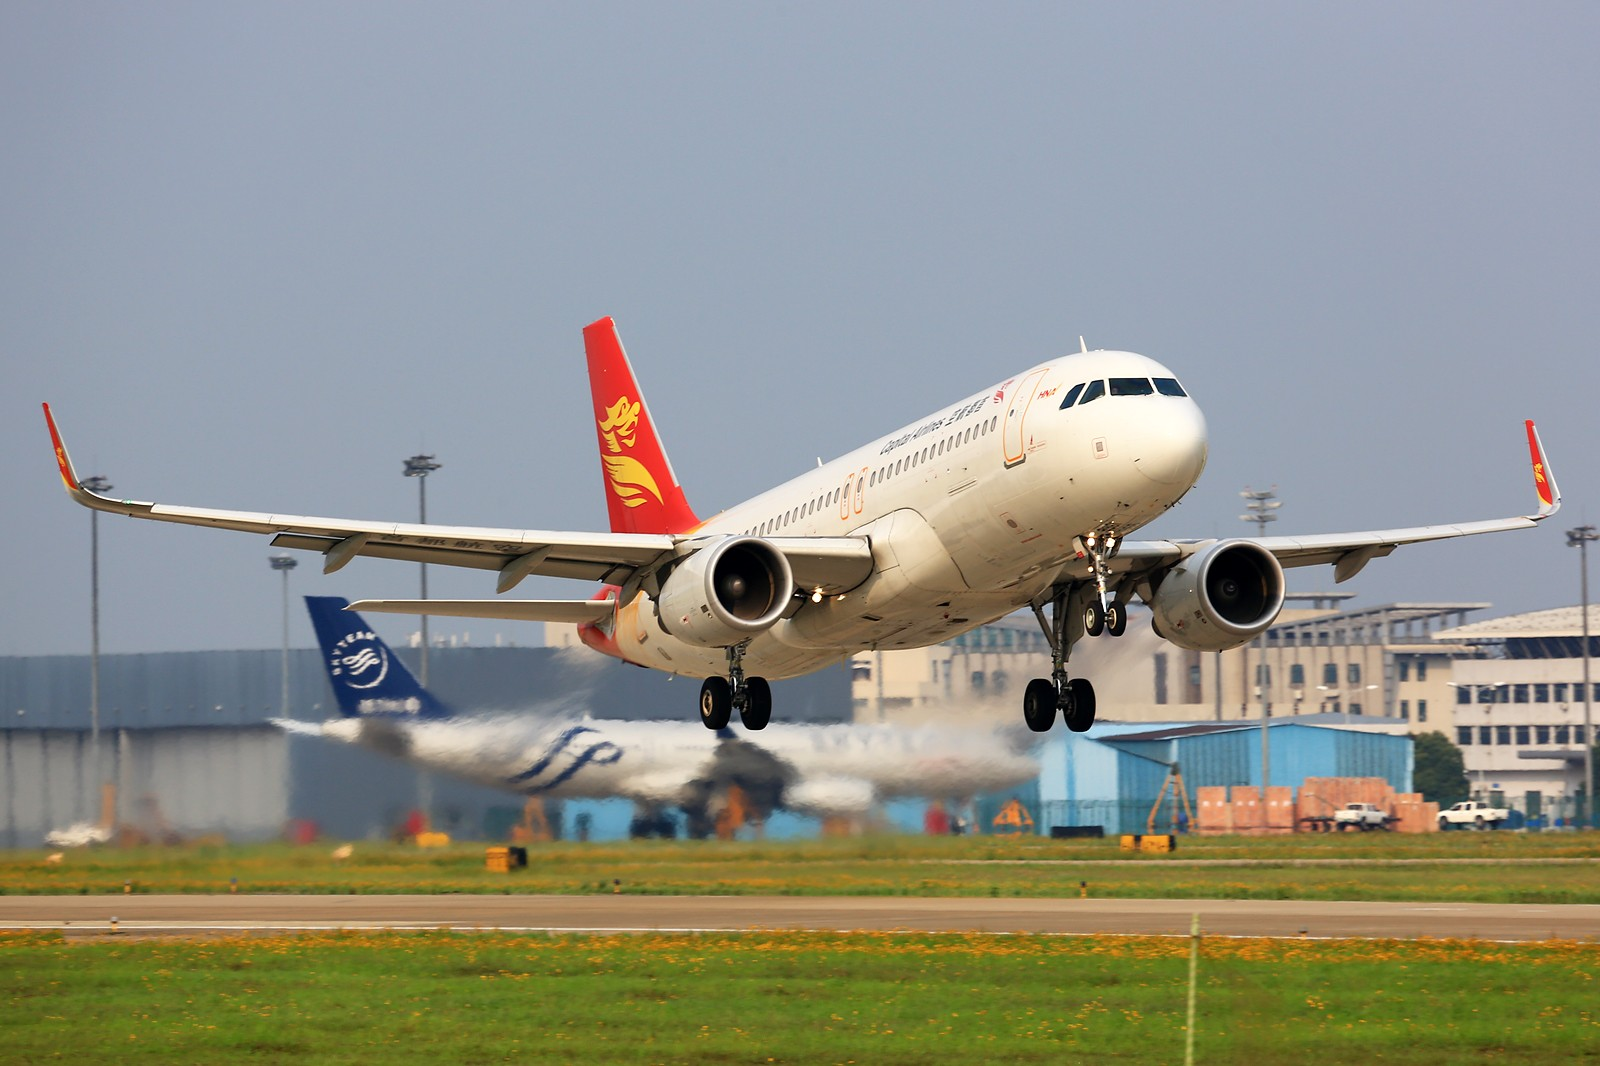 Re:【NKG】******小公园一天蹲到俩毛子:奥伦堡772+伏尔加第聂伯IL-76TD****** AIRBUS A320-200 B-9961 中国南京禄口国际机场